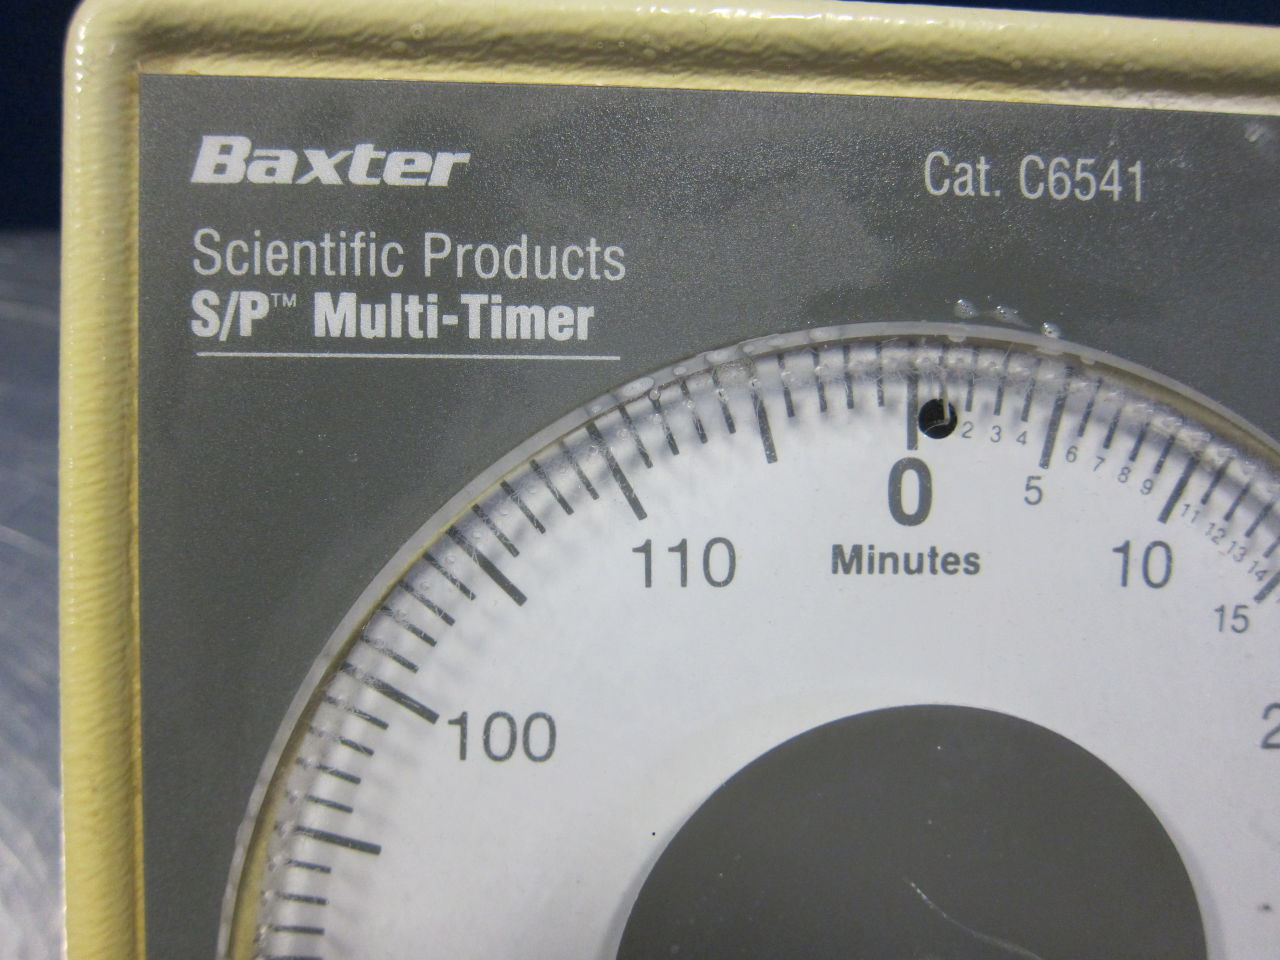 BAXTER C6541 Multi-Timer